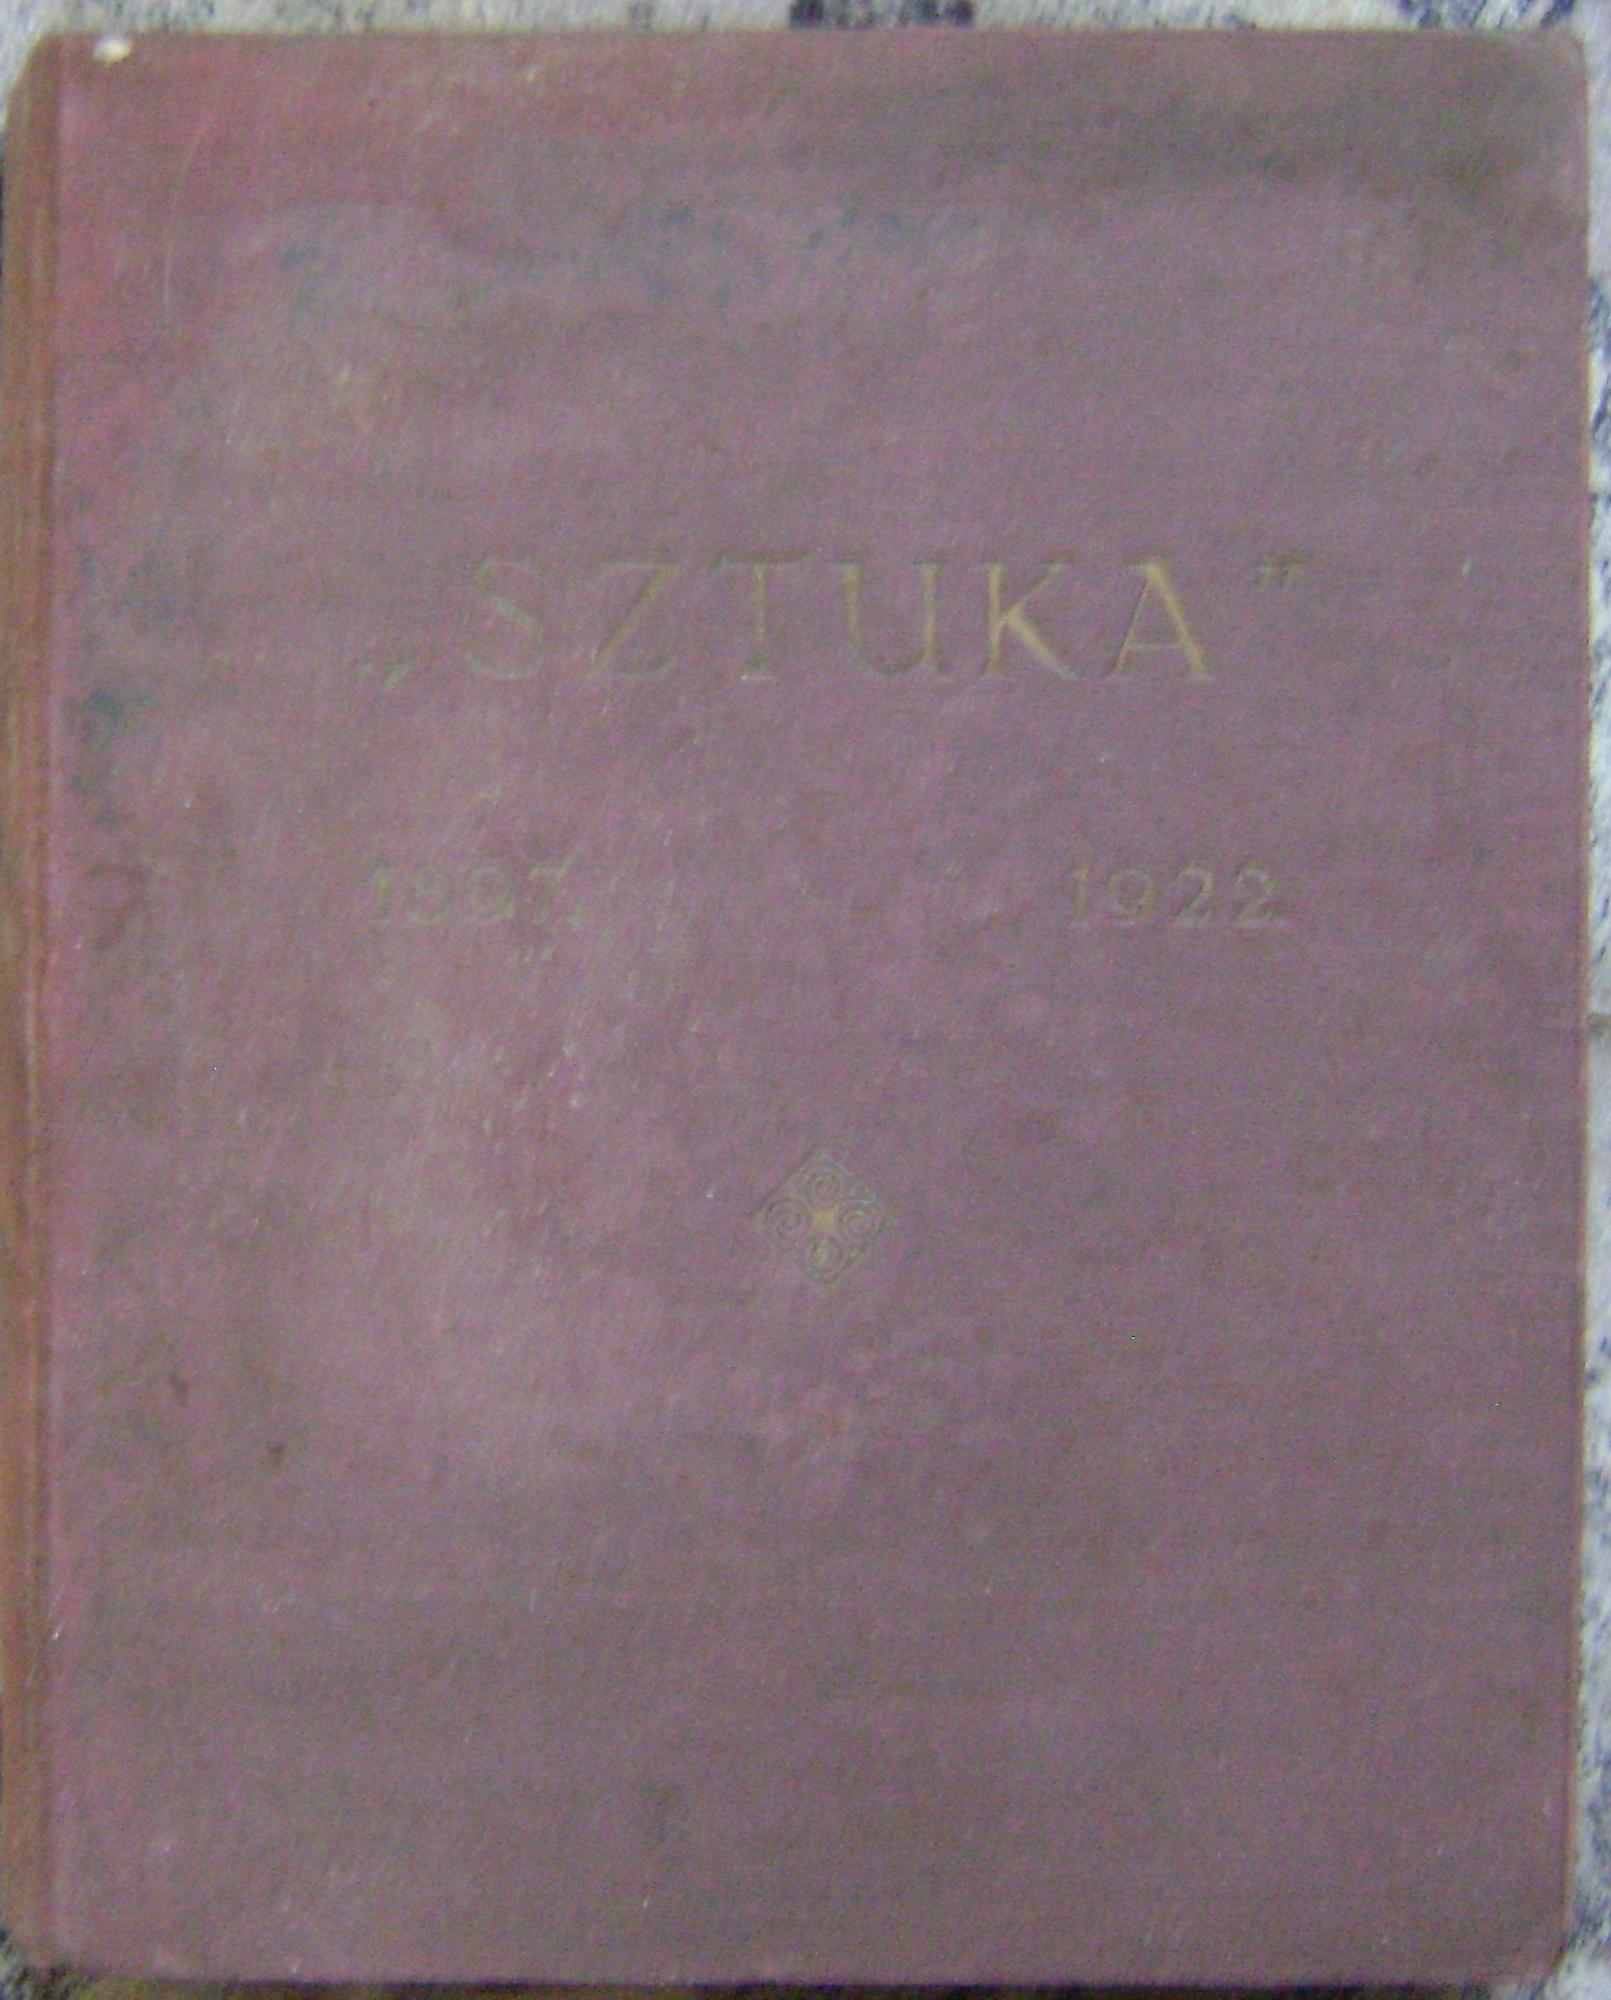 SZTUKA 1897-1922 -ALBUM -wyd.1922